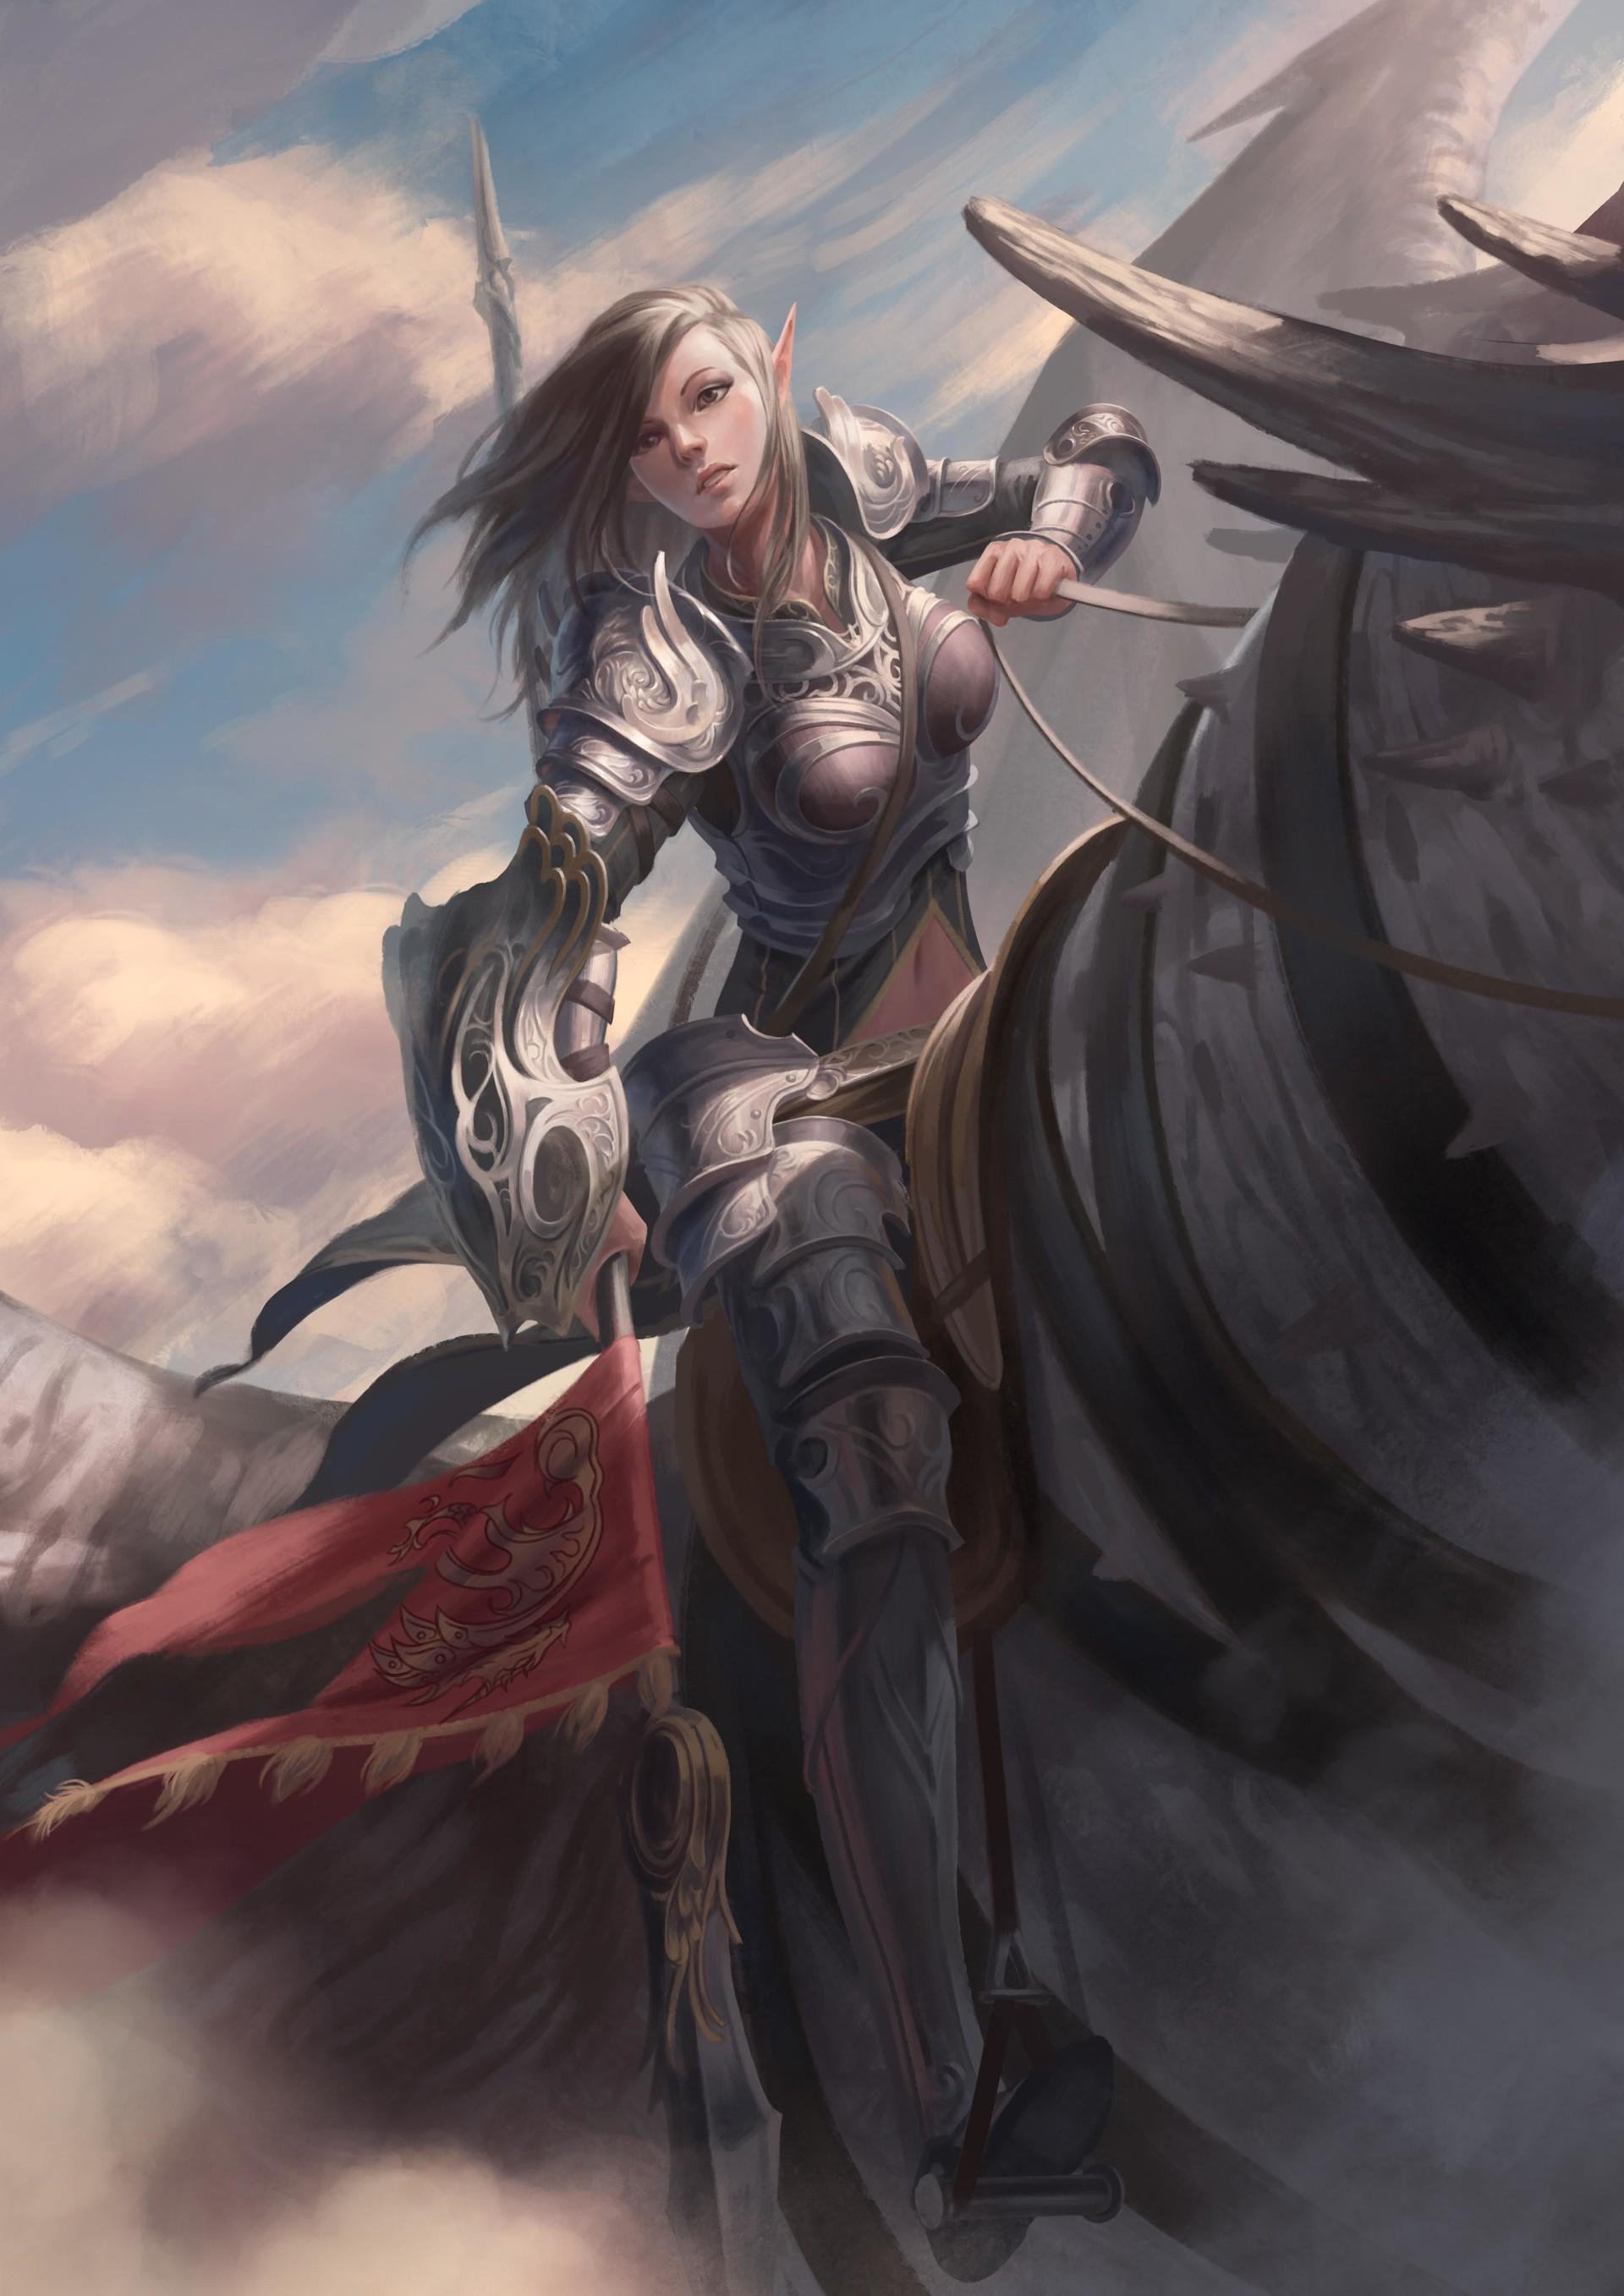 Horse Riding Wallpaper Hd Wallpaper Illustration Fantasy Art Anime Dragon